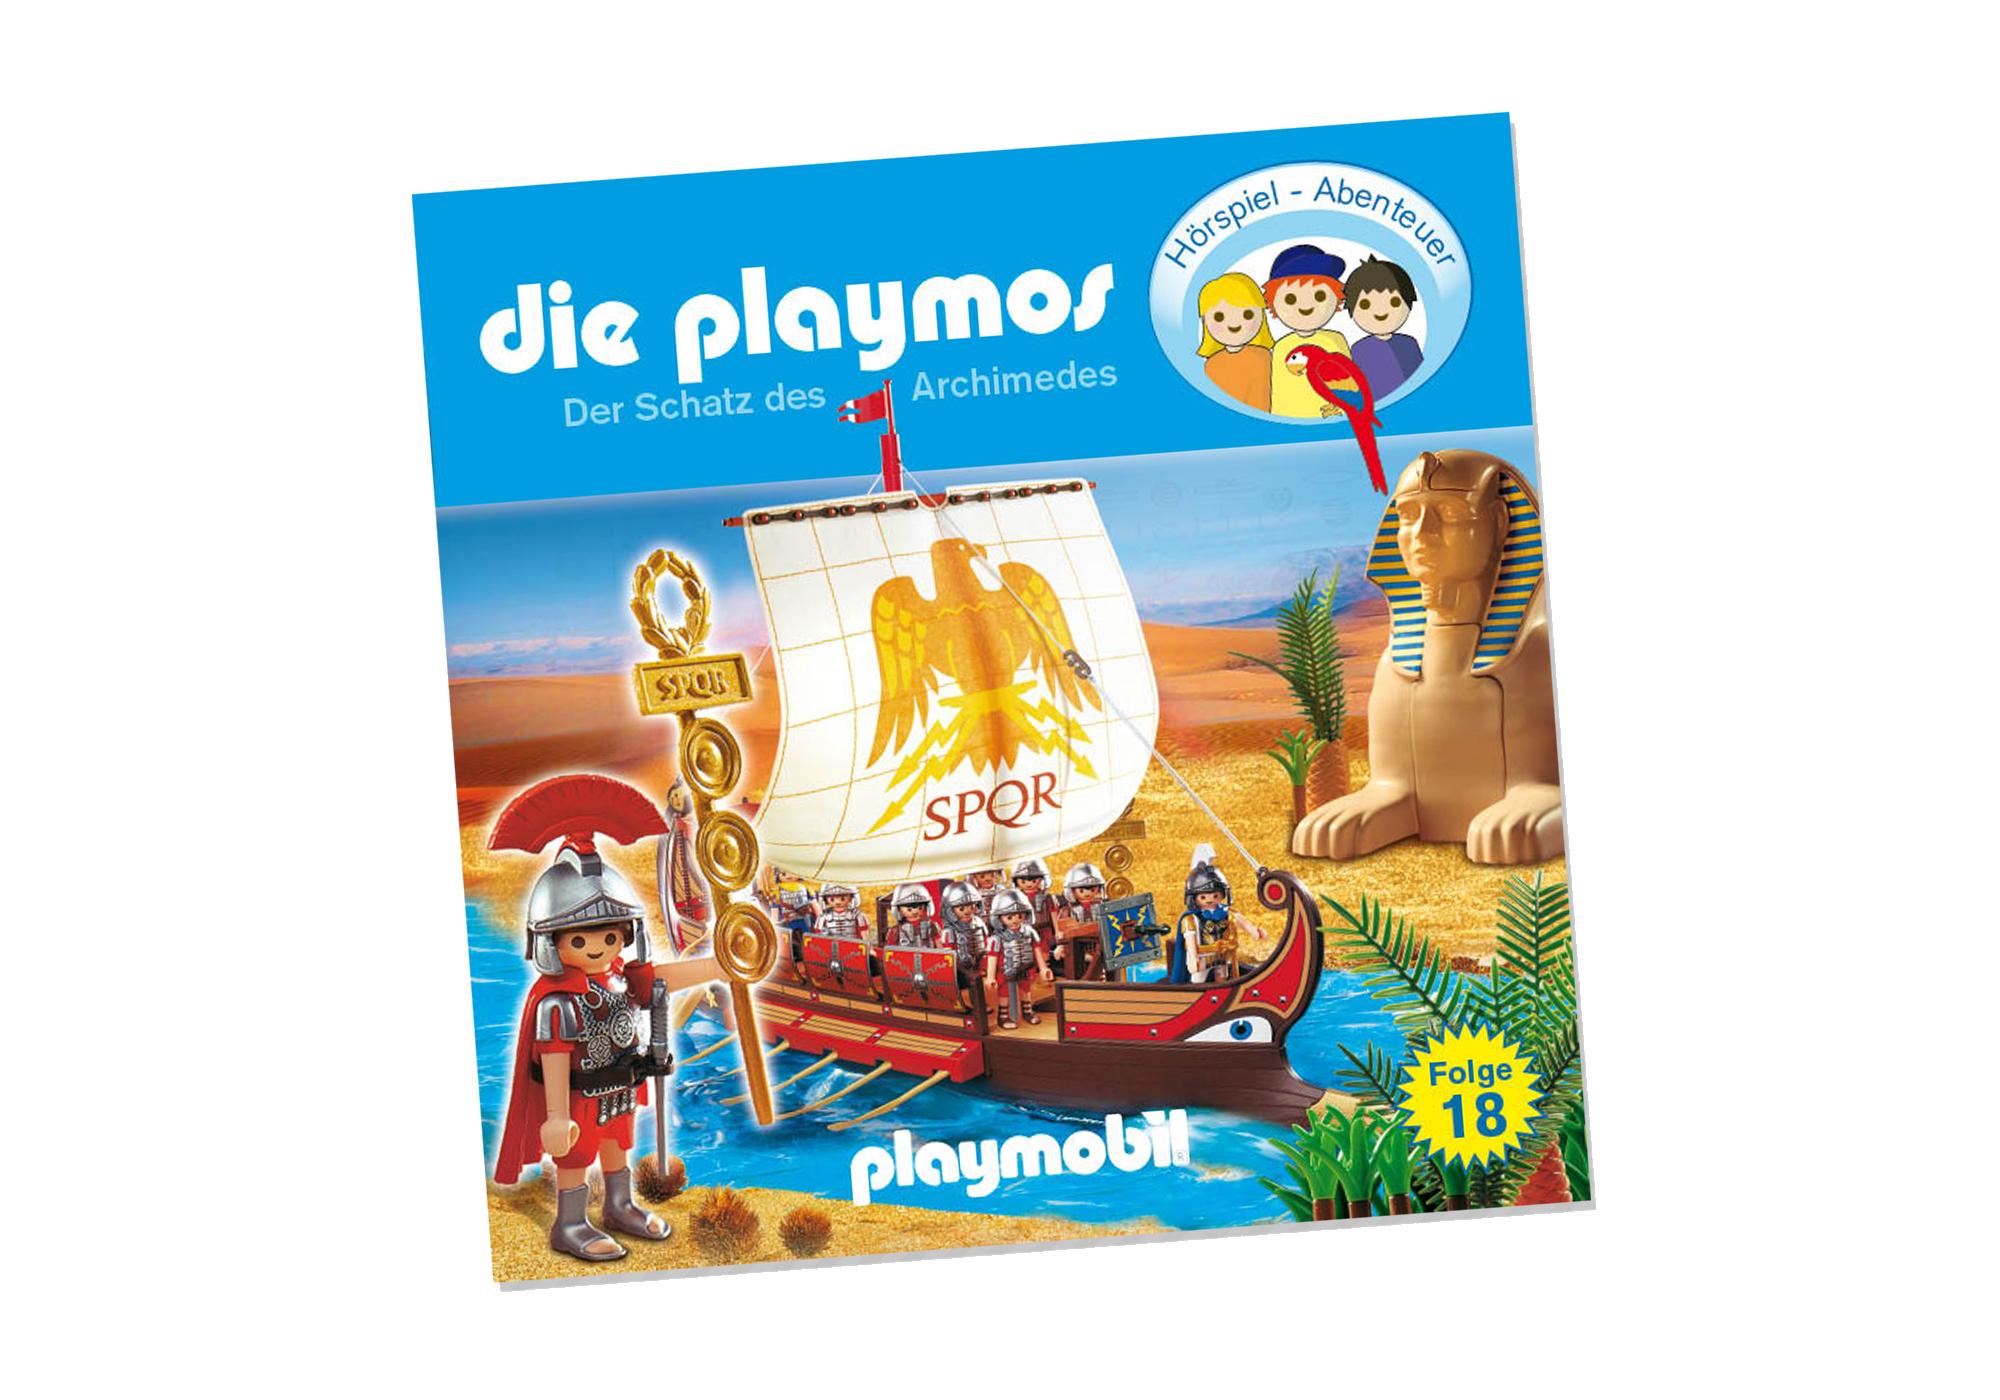 http://media.playmobil.com/i/playmobil/80271_product_detail